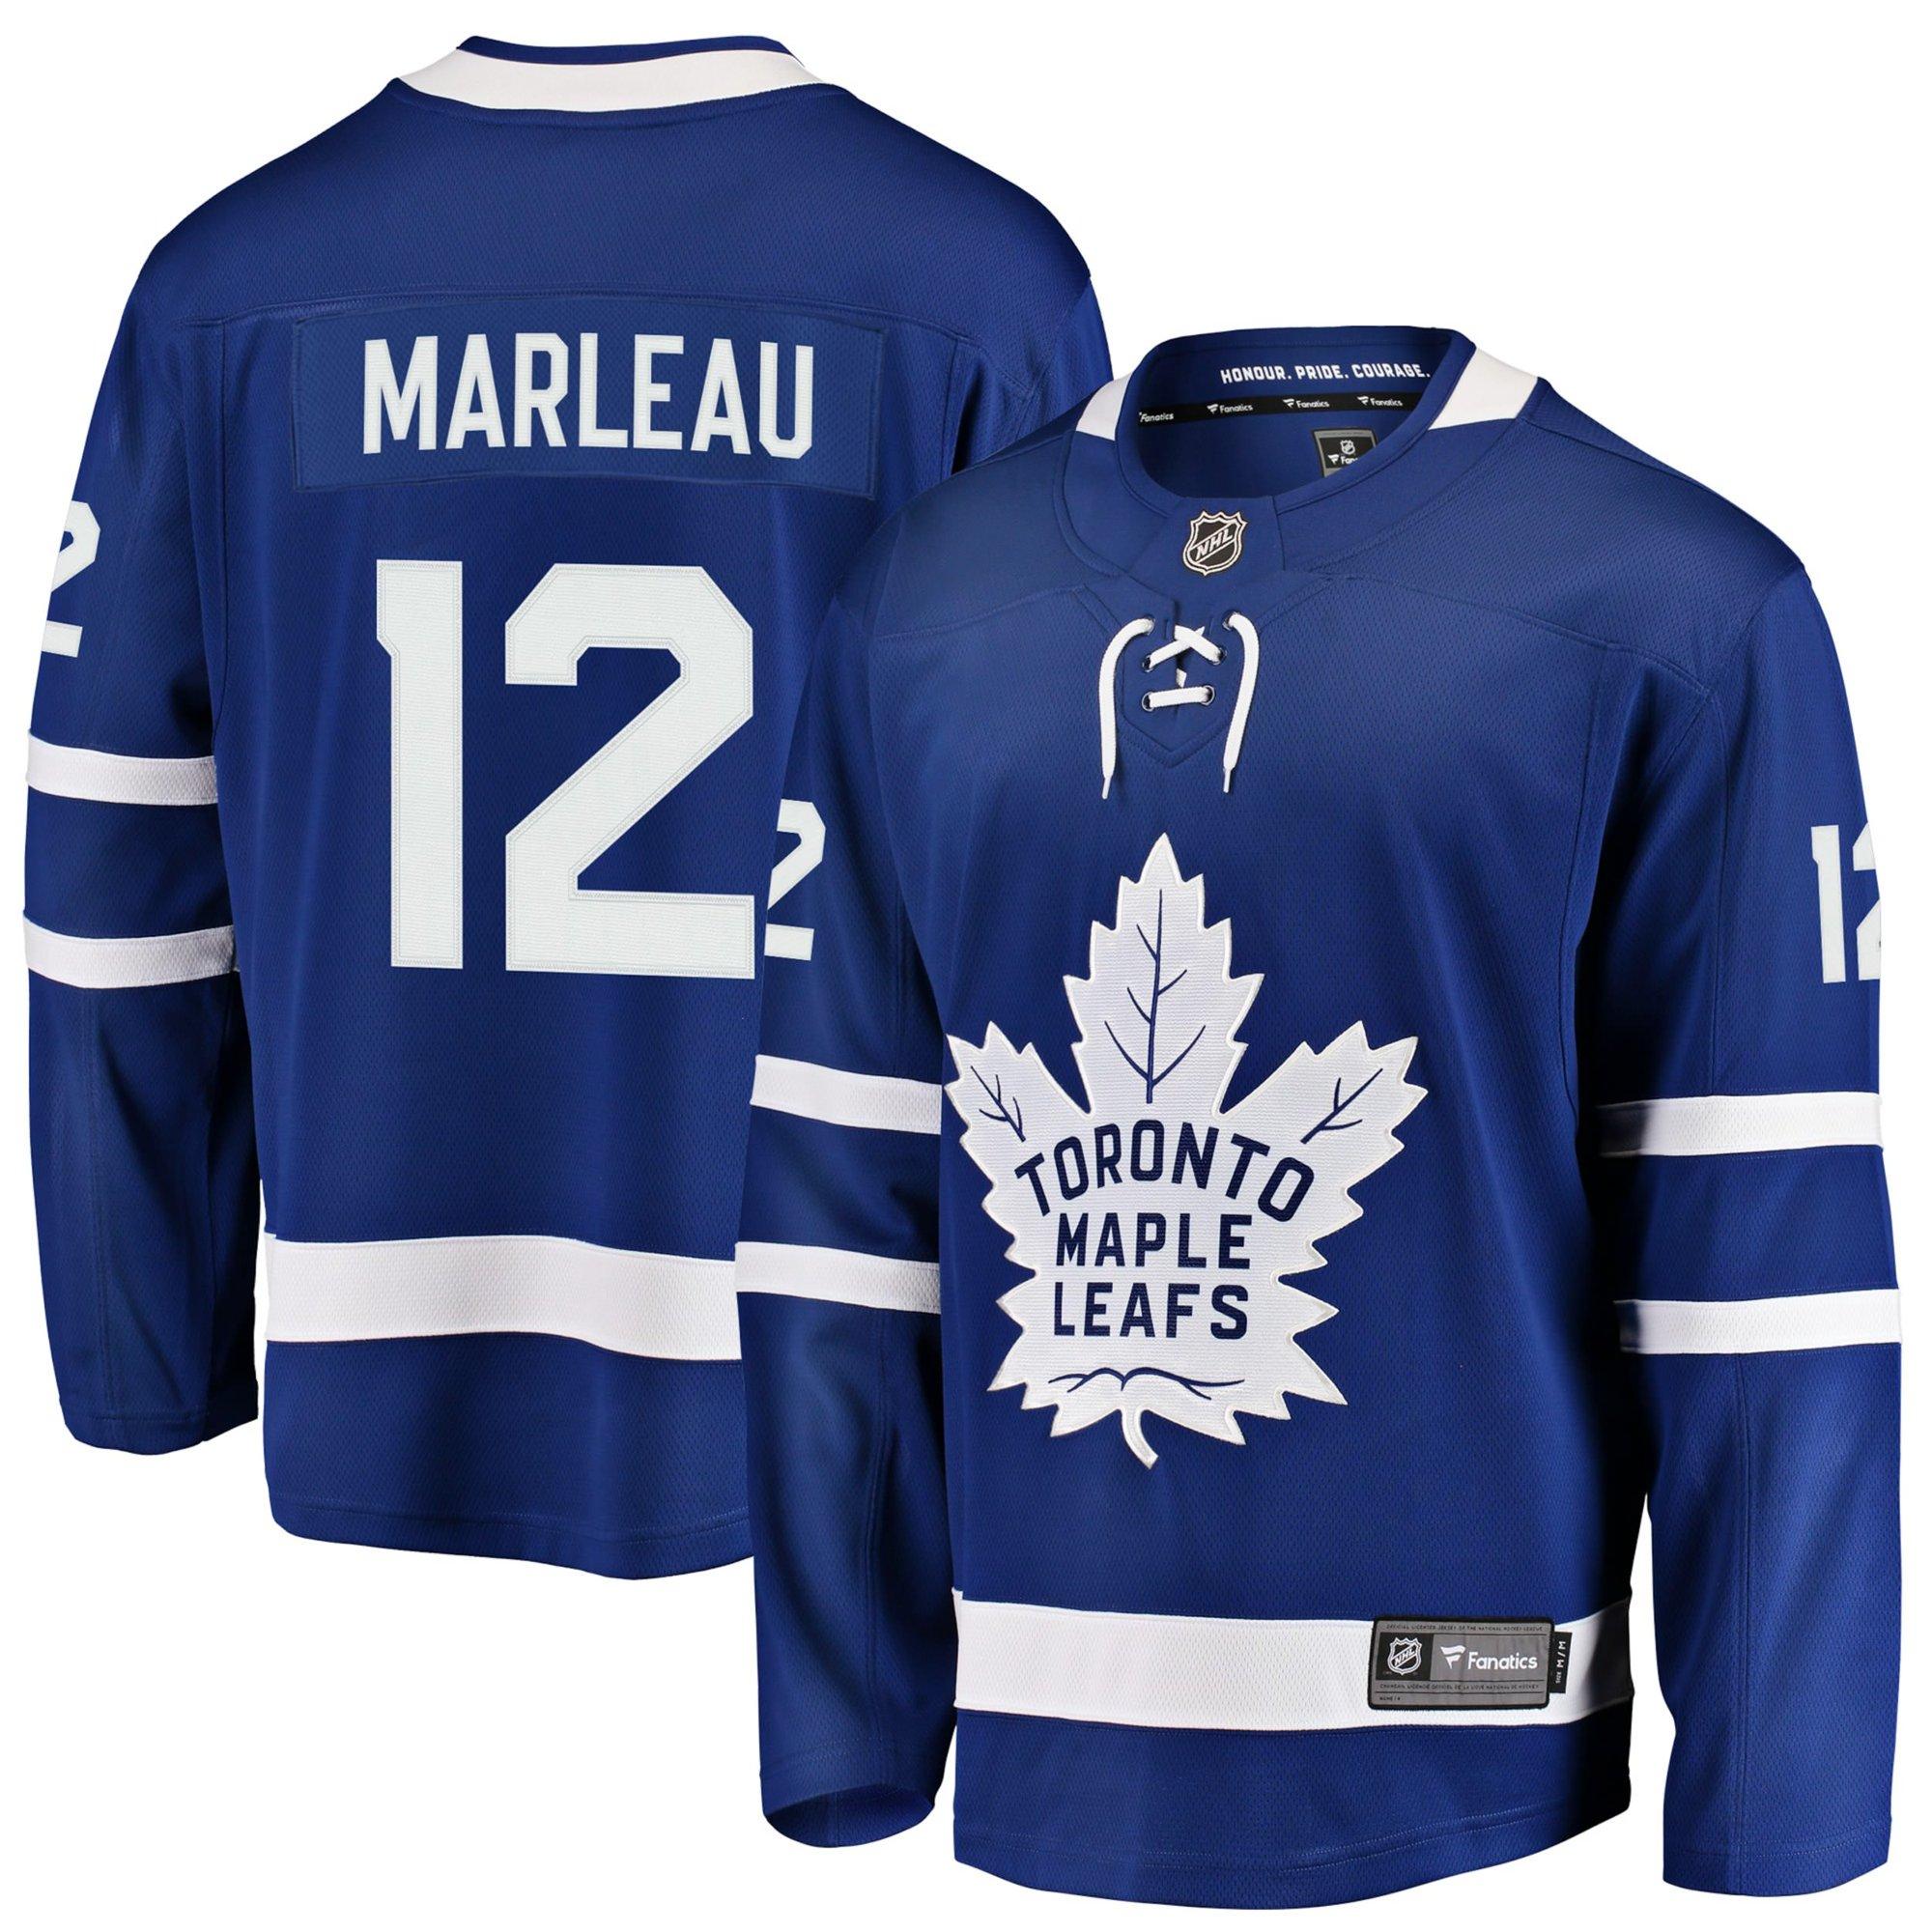 official photos 0129f 4b177 Patrick Marleau Toronto Maple Leafs NHL Fanatics Breakaway ...